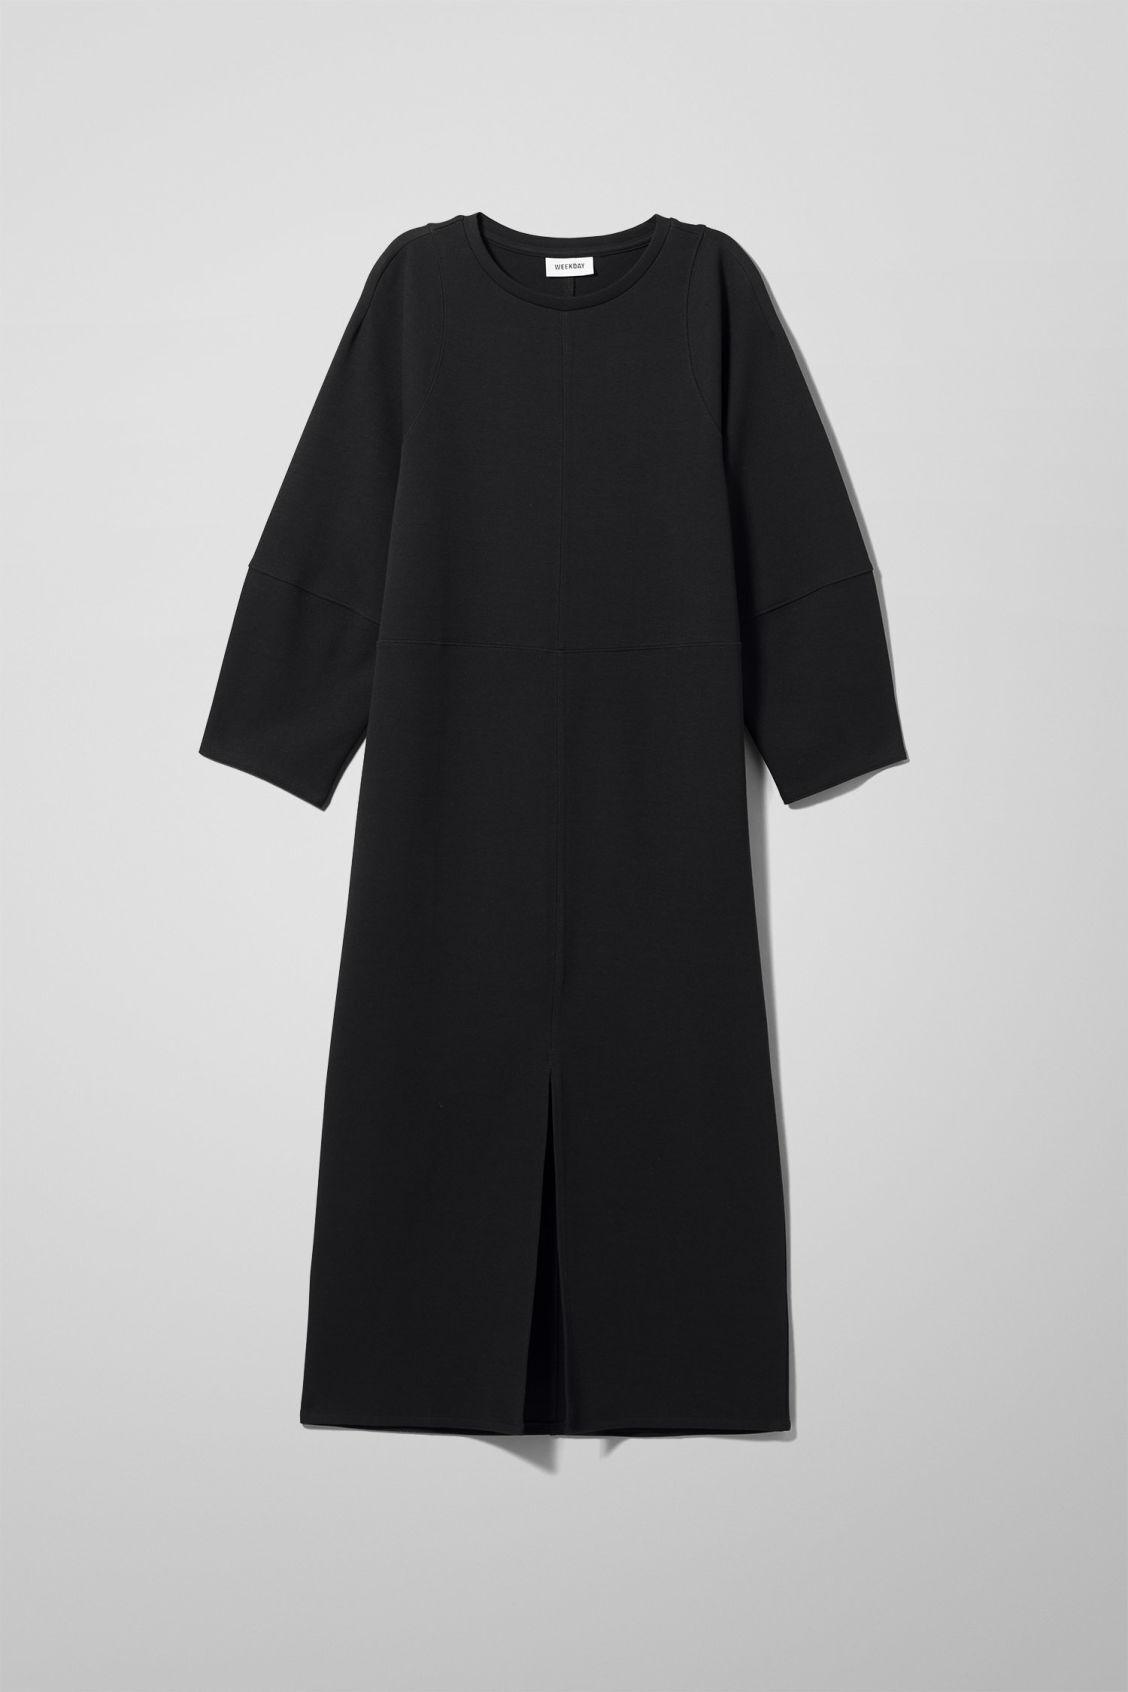 Image of Rena Dress - Black-XS